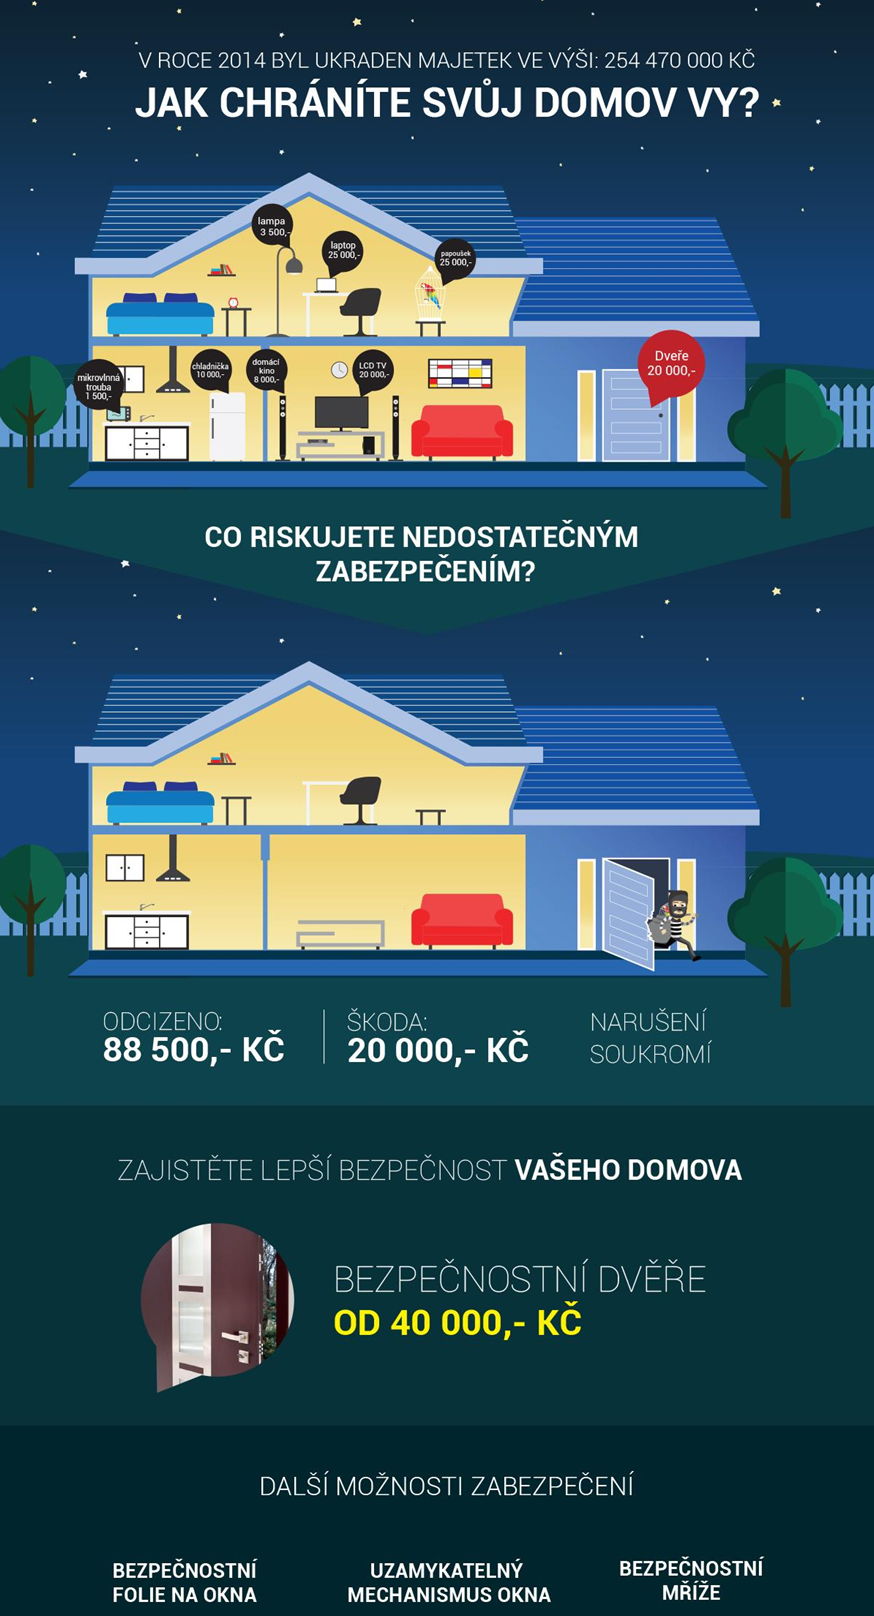 Jak chránit dům?